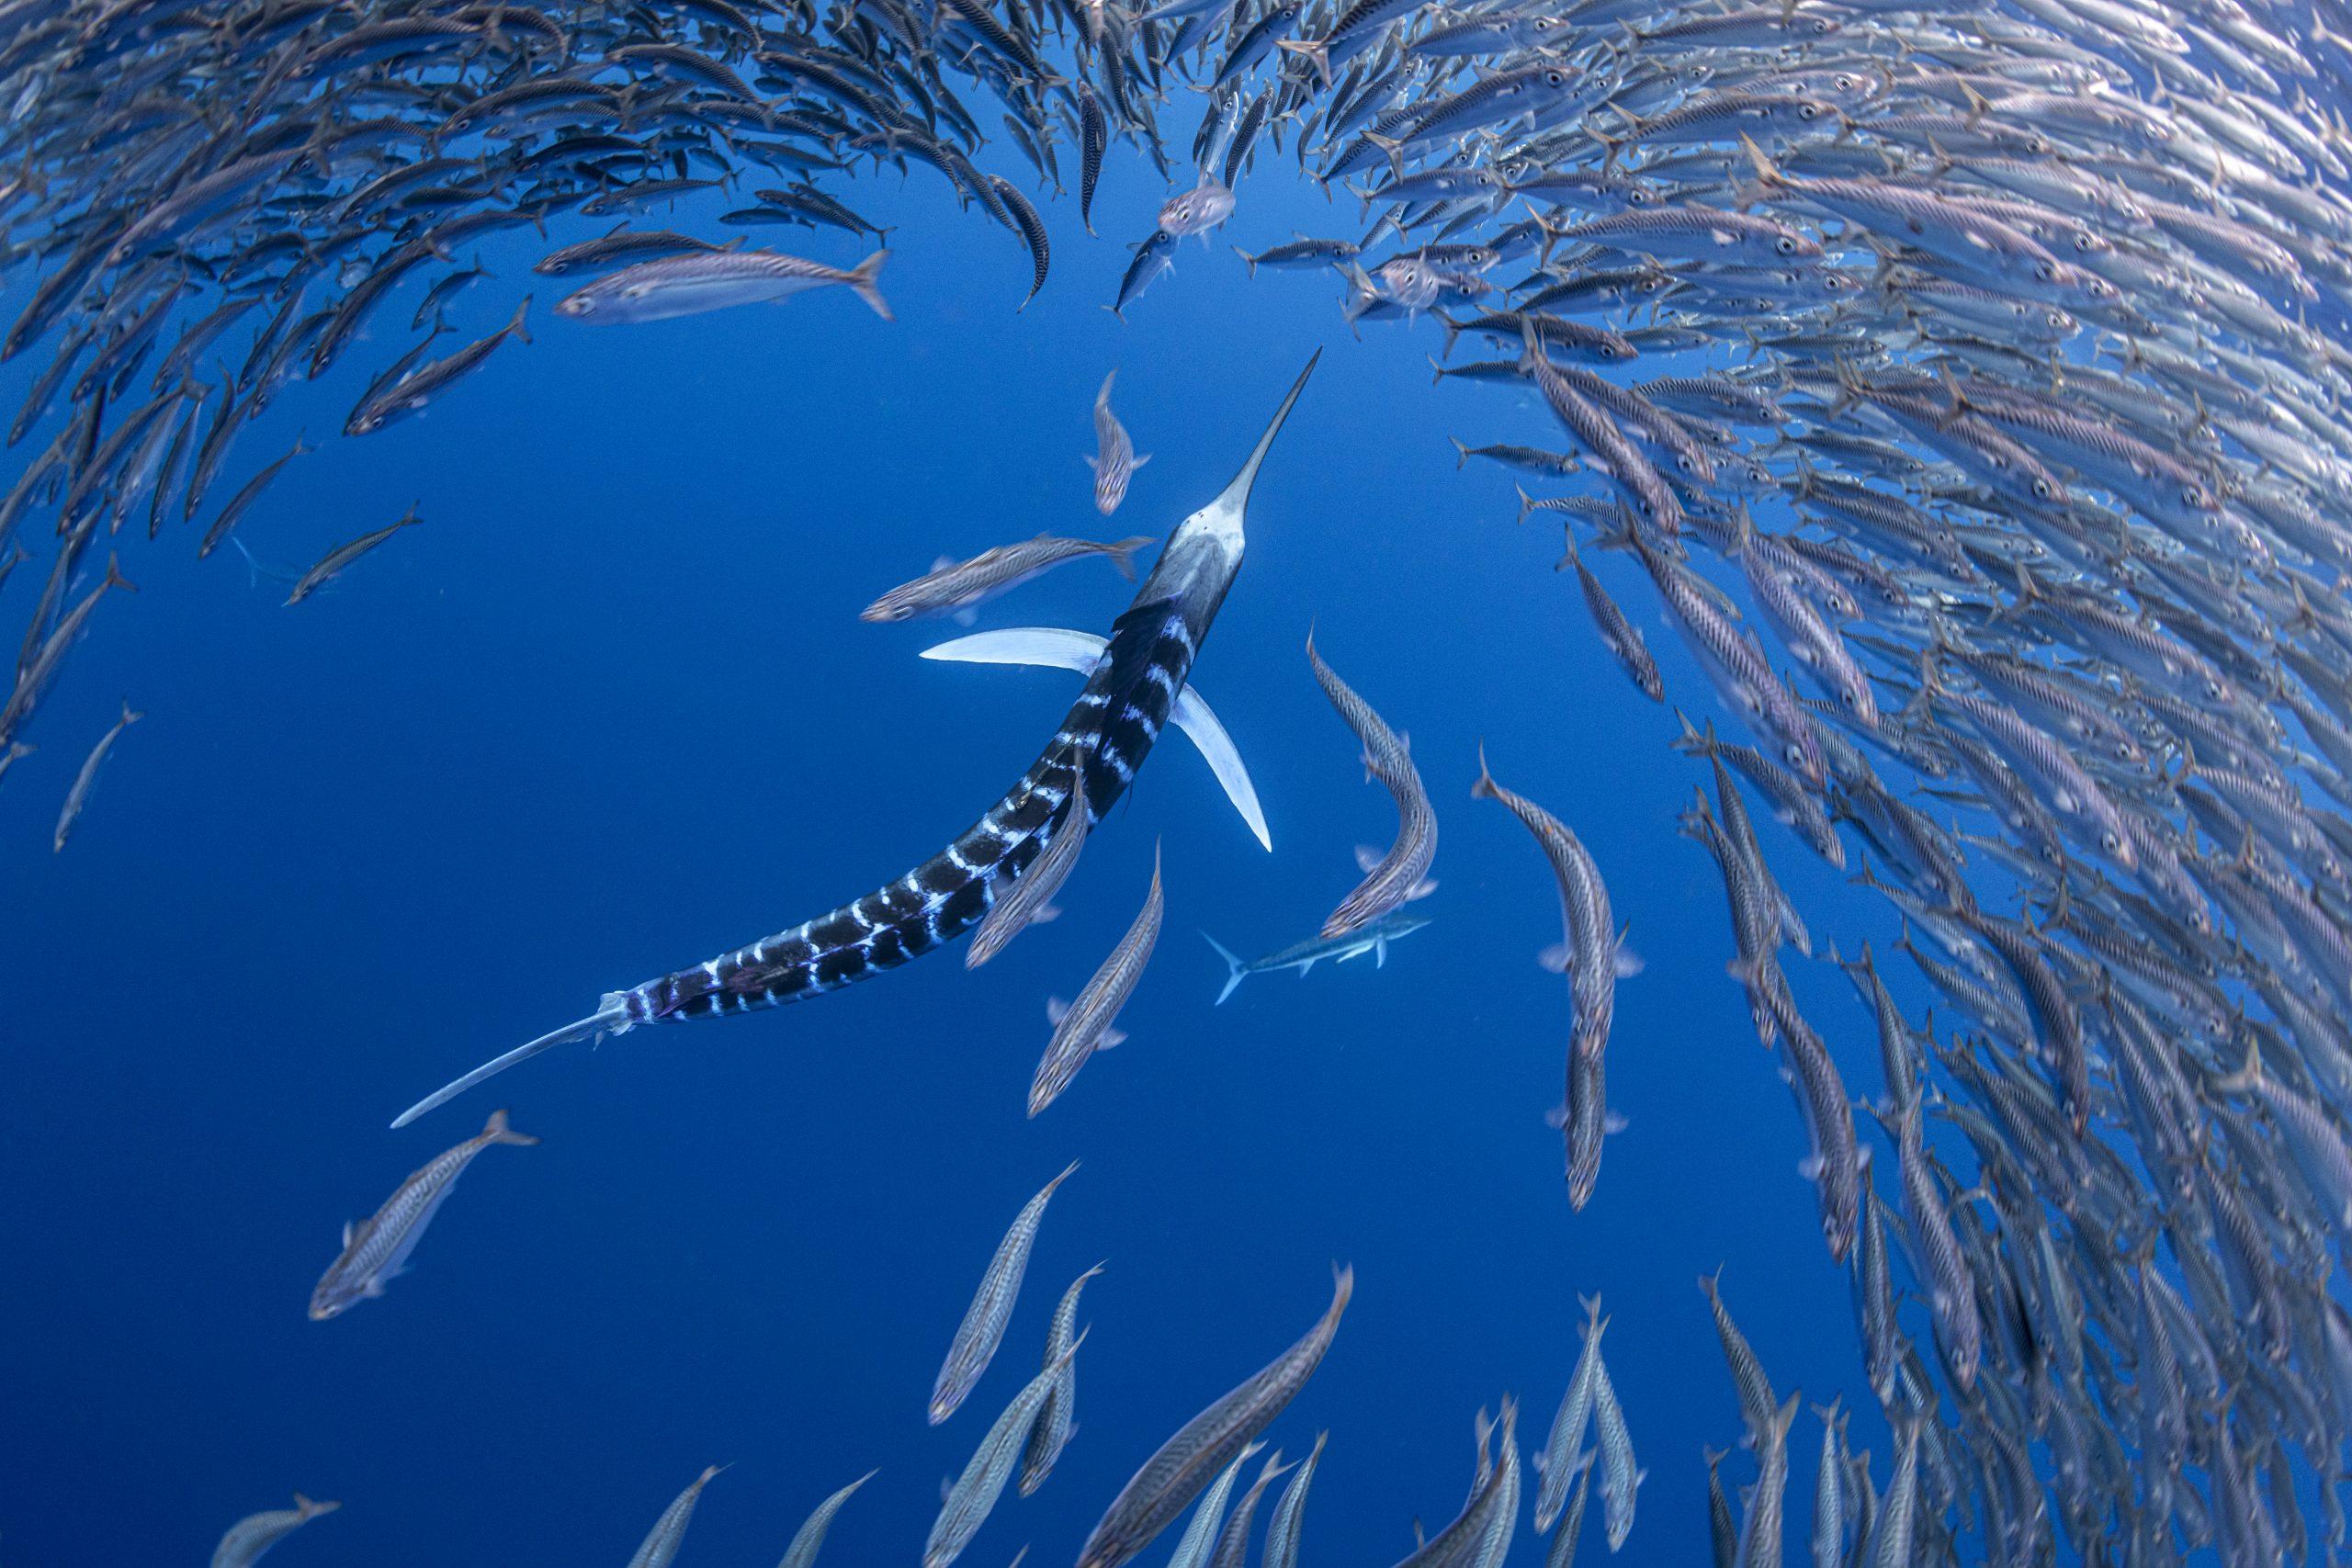 A striped marlin pursues baitfish off the coast of Baja California Sur.